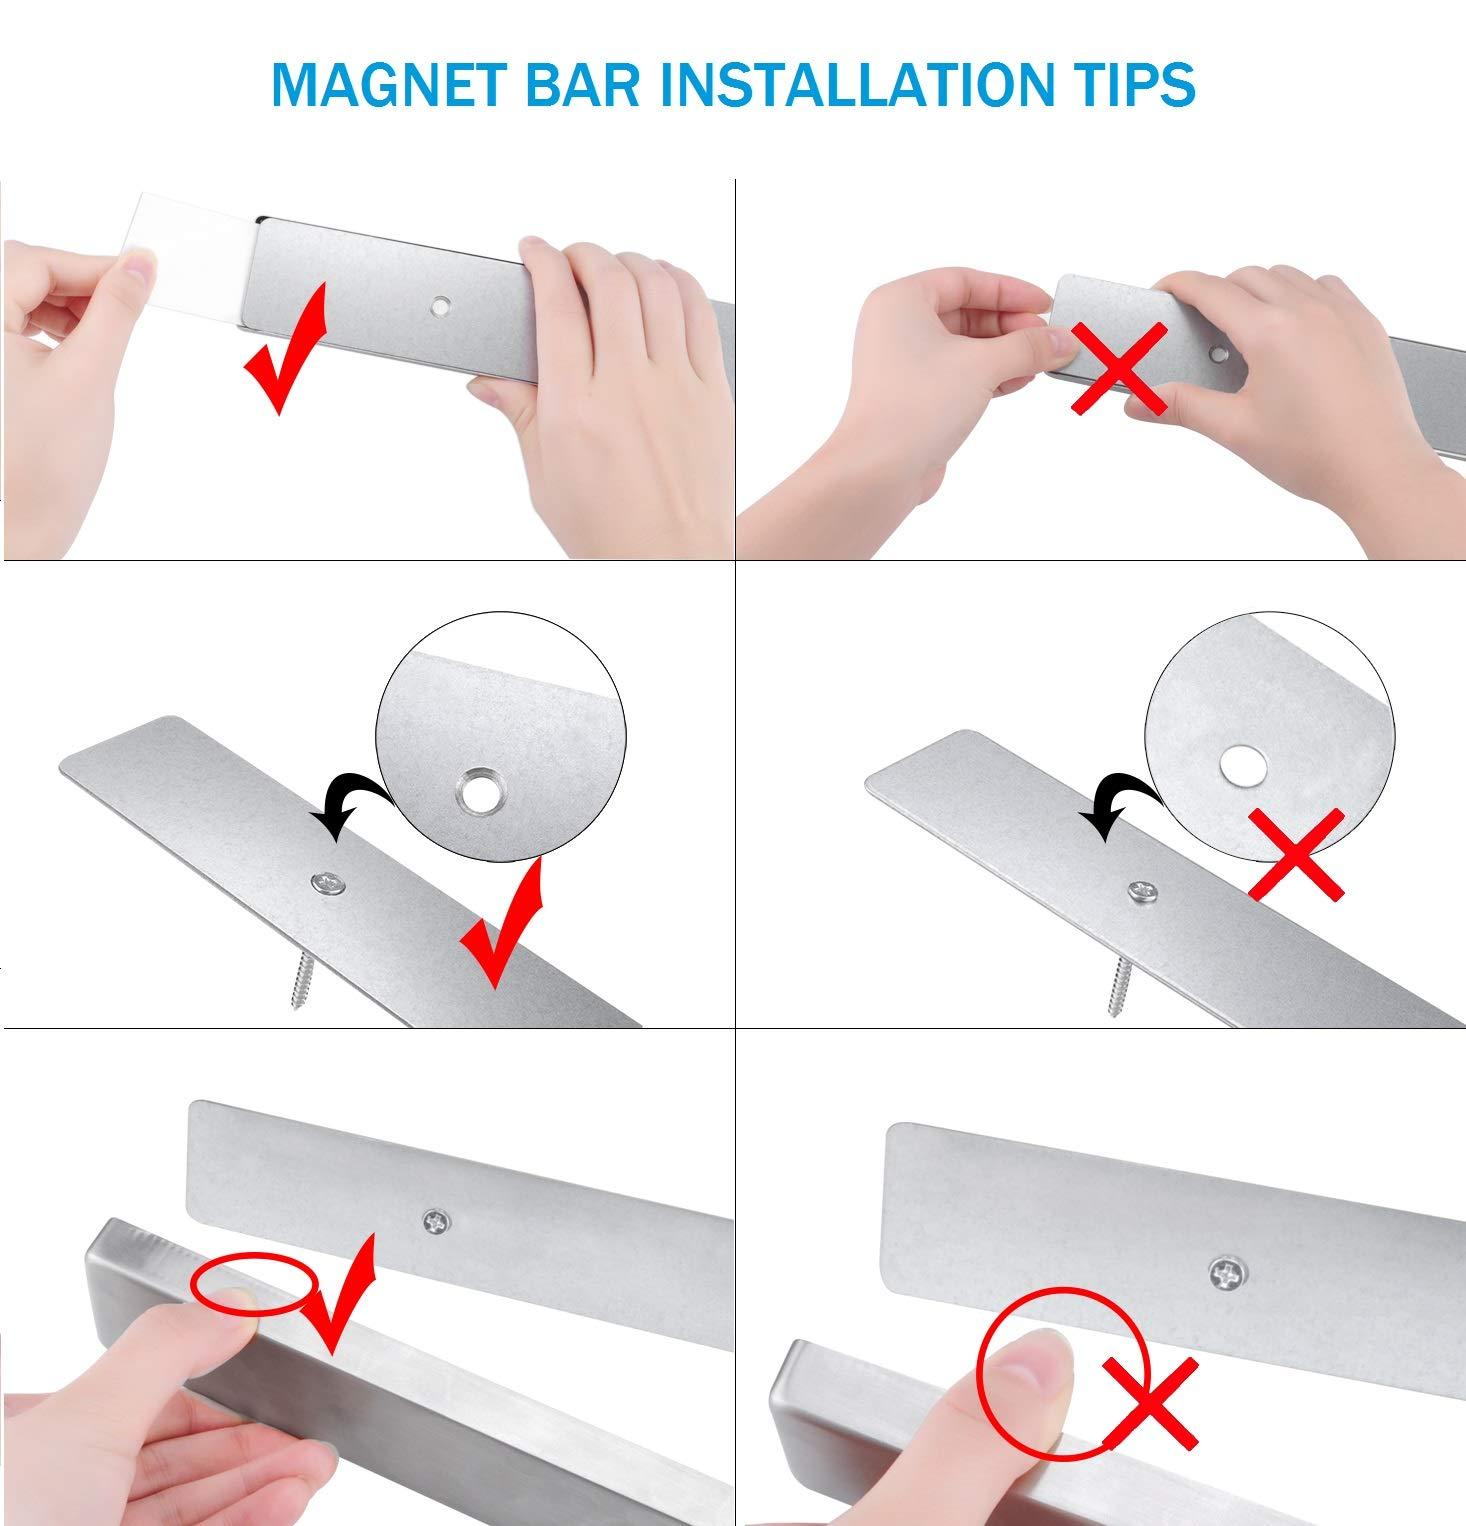 NUNET 16 Inch Stainless Steel Magnetic Knife Bar 4 Hanger Hooks with Adhesive Pad Strong Magnet as Knife Rack/Strip, Kitchen Utensil Hanger, Garage Tool Holder & Home Organizer by NUNET (Image #4)